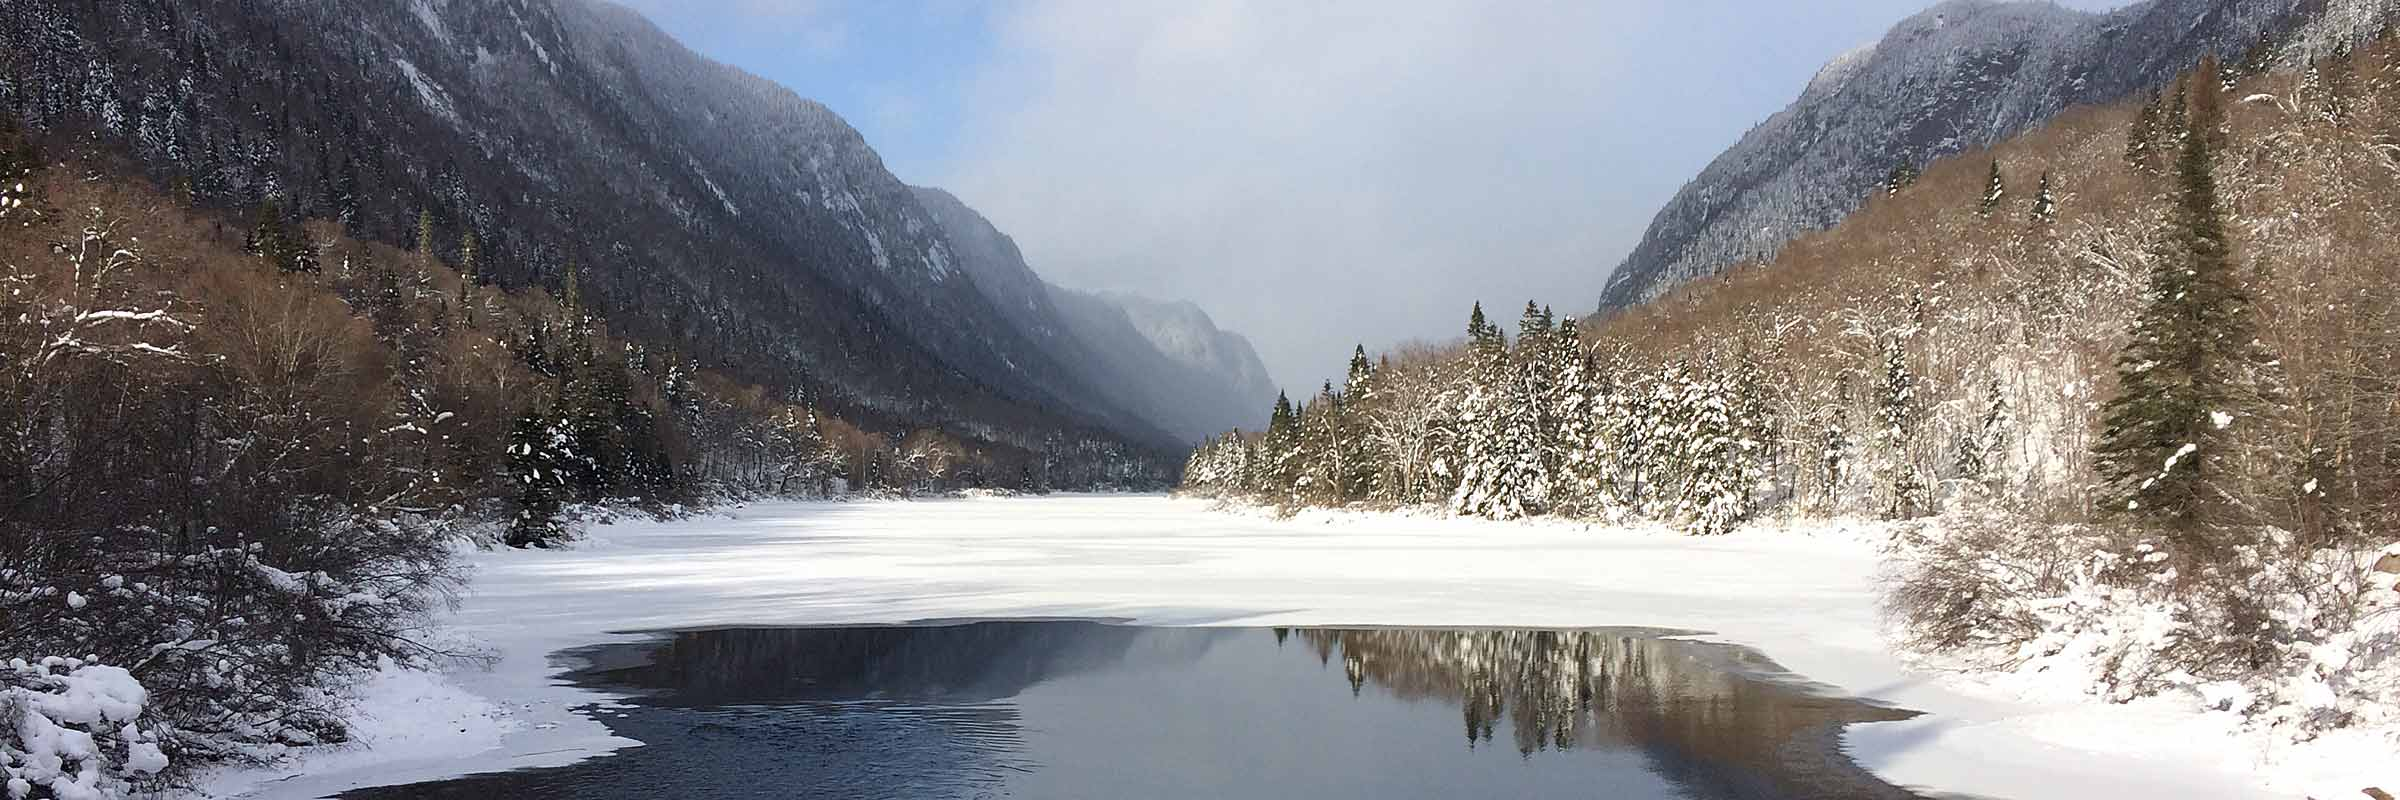 paysage-canada-hiver-slider